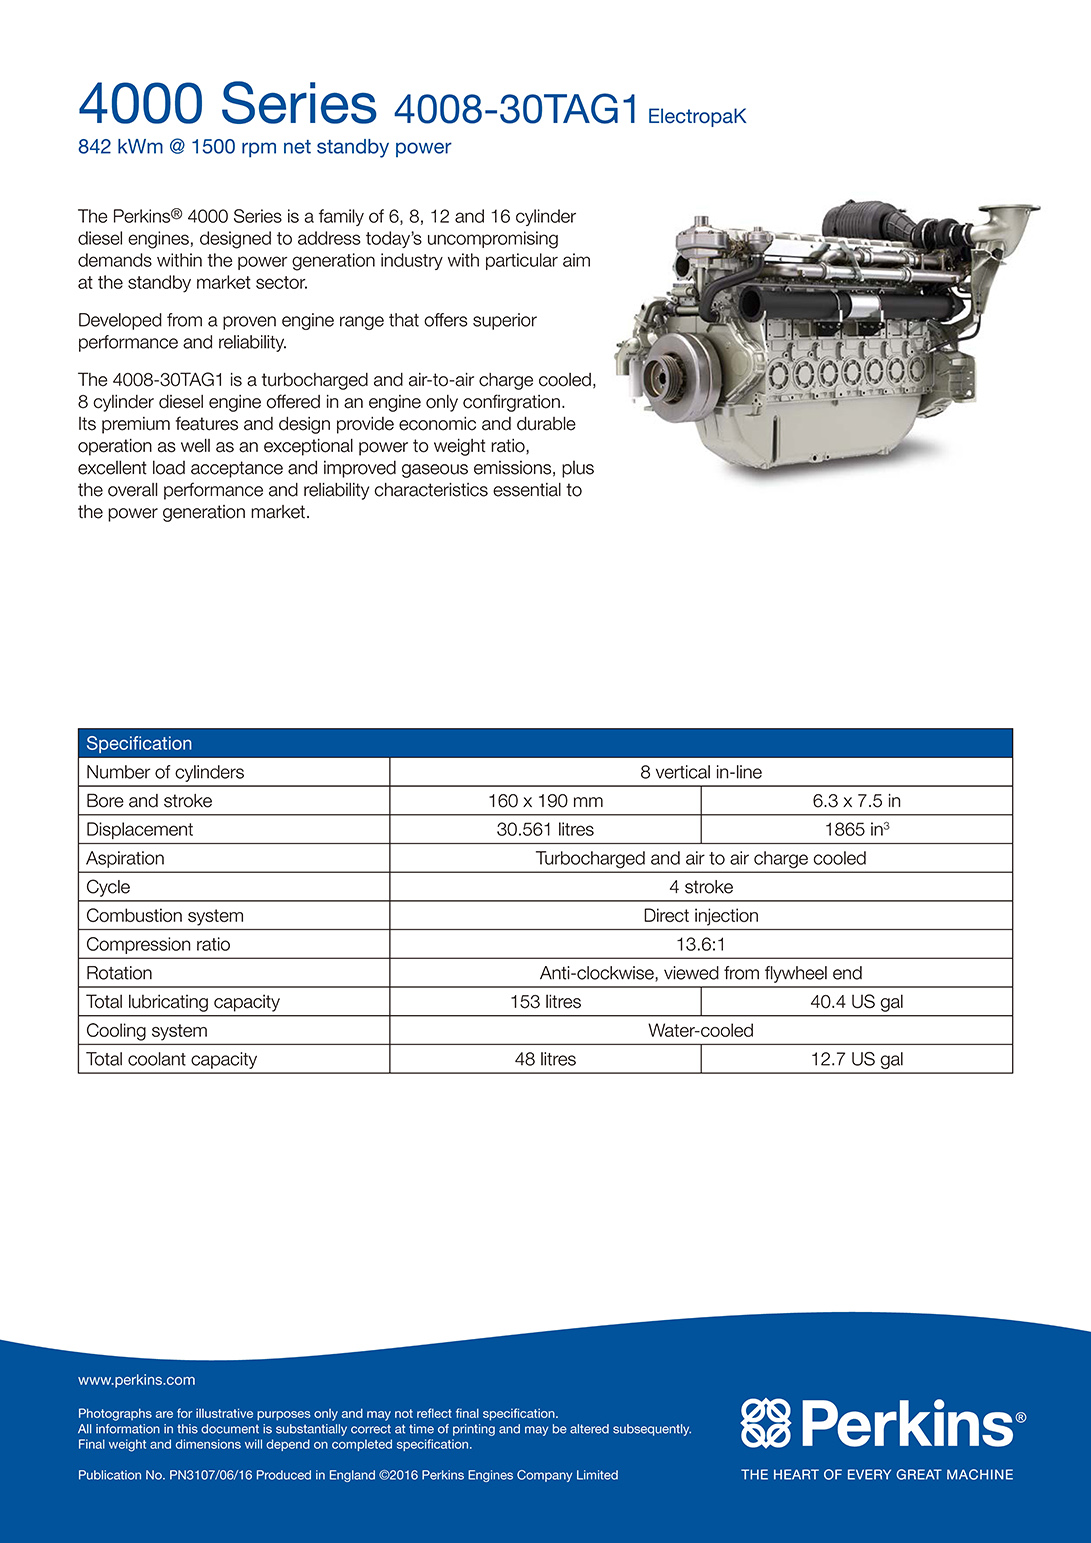 4008-30TAG2 1500 rpm ElectropaK PN3108_SIME DARBY ELCO POWER